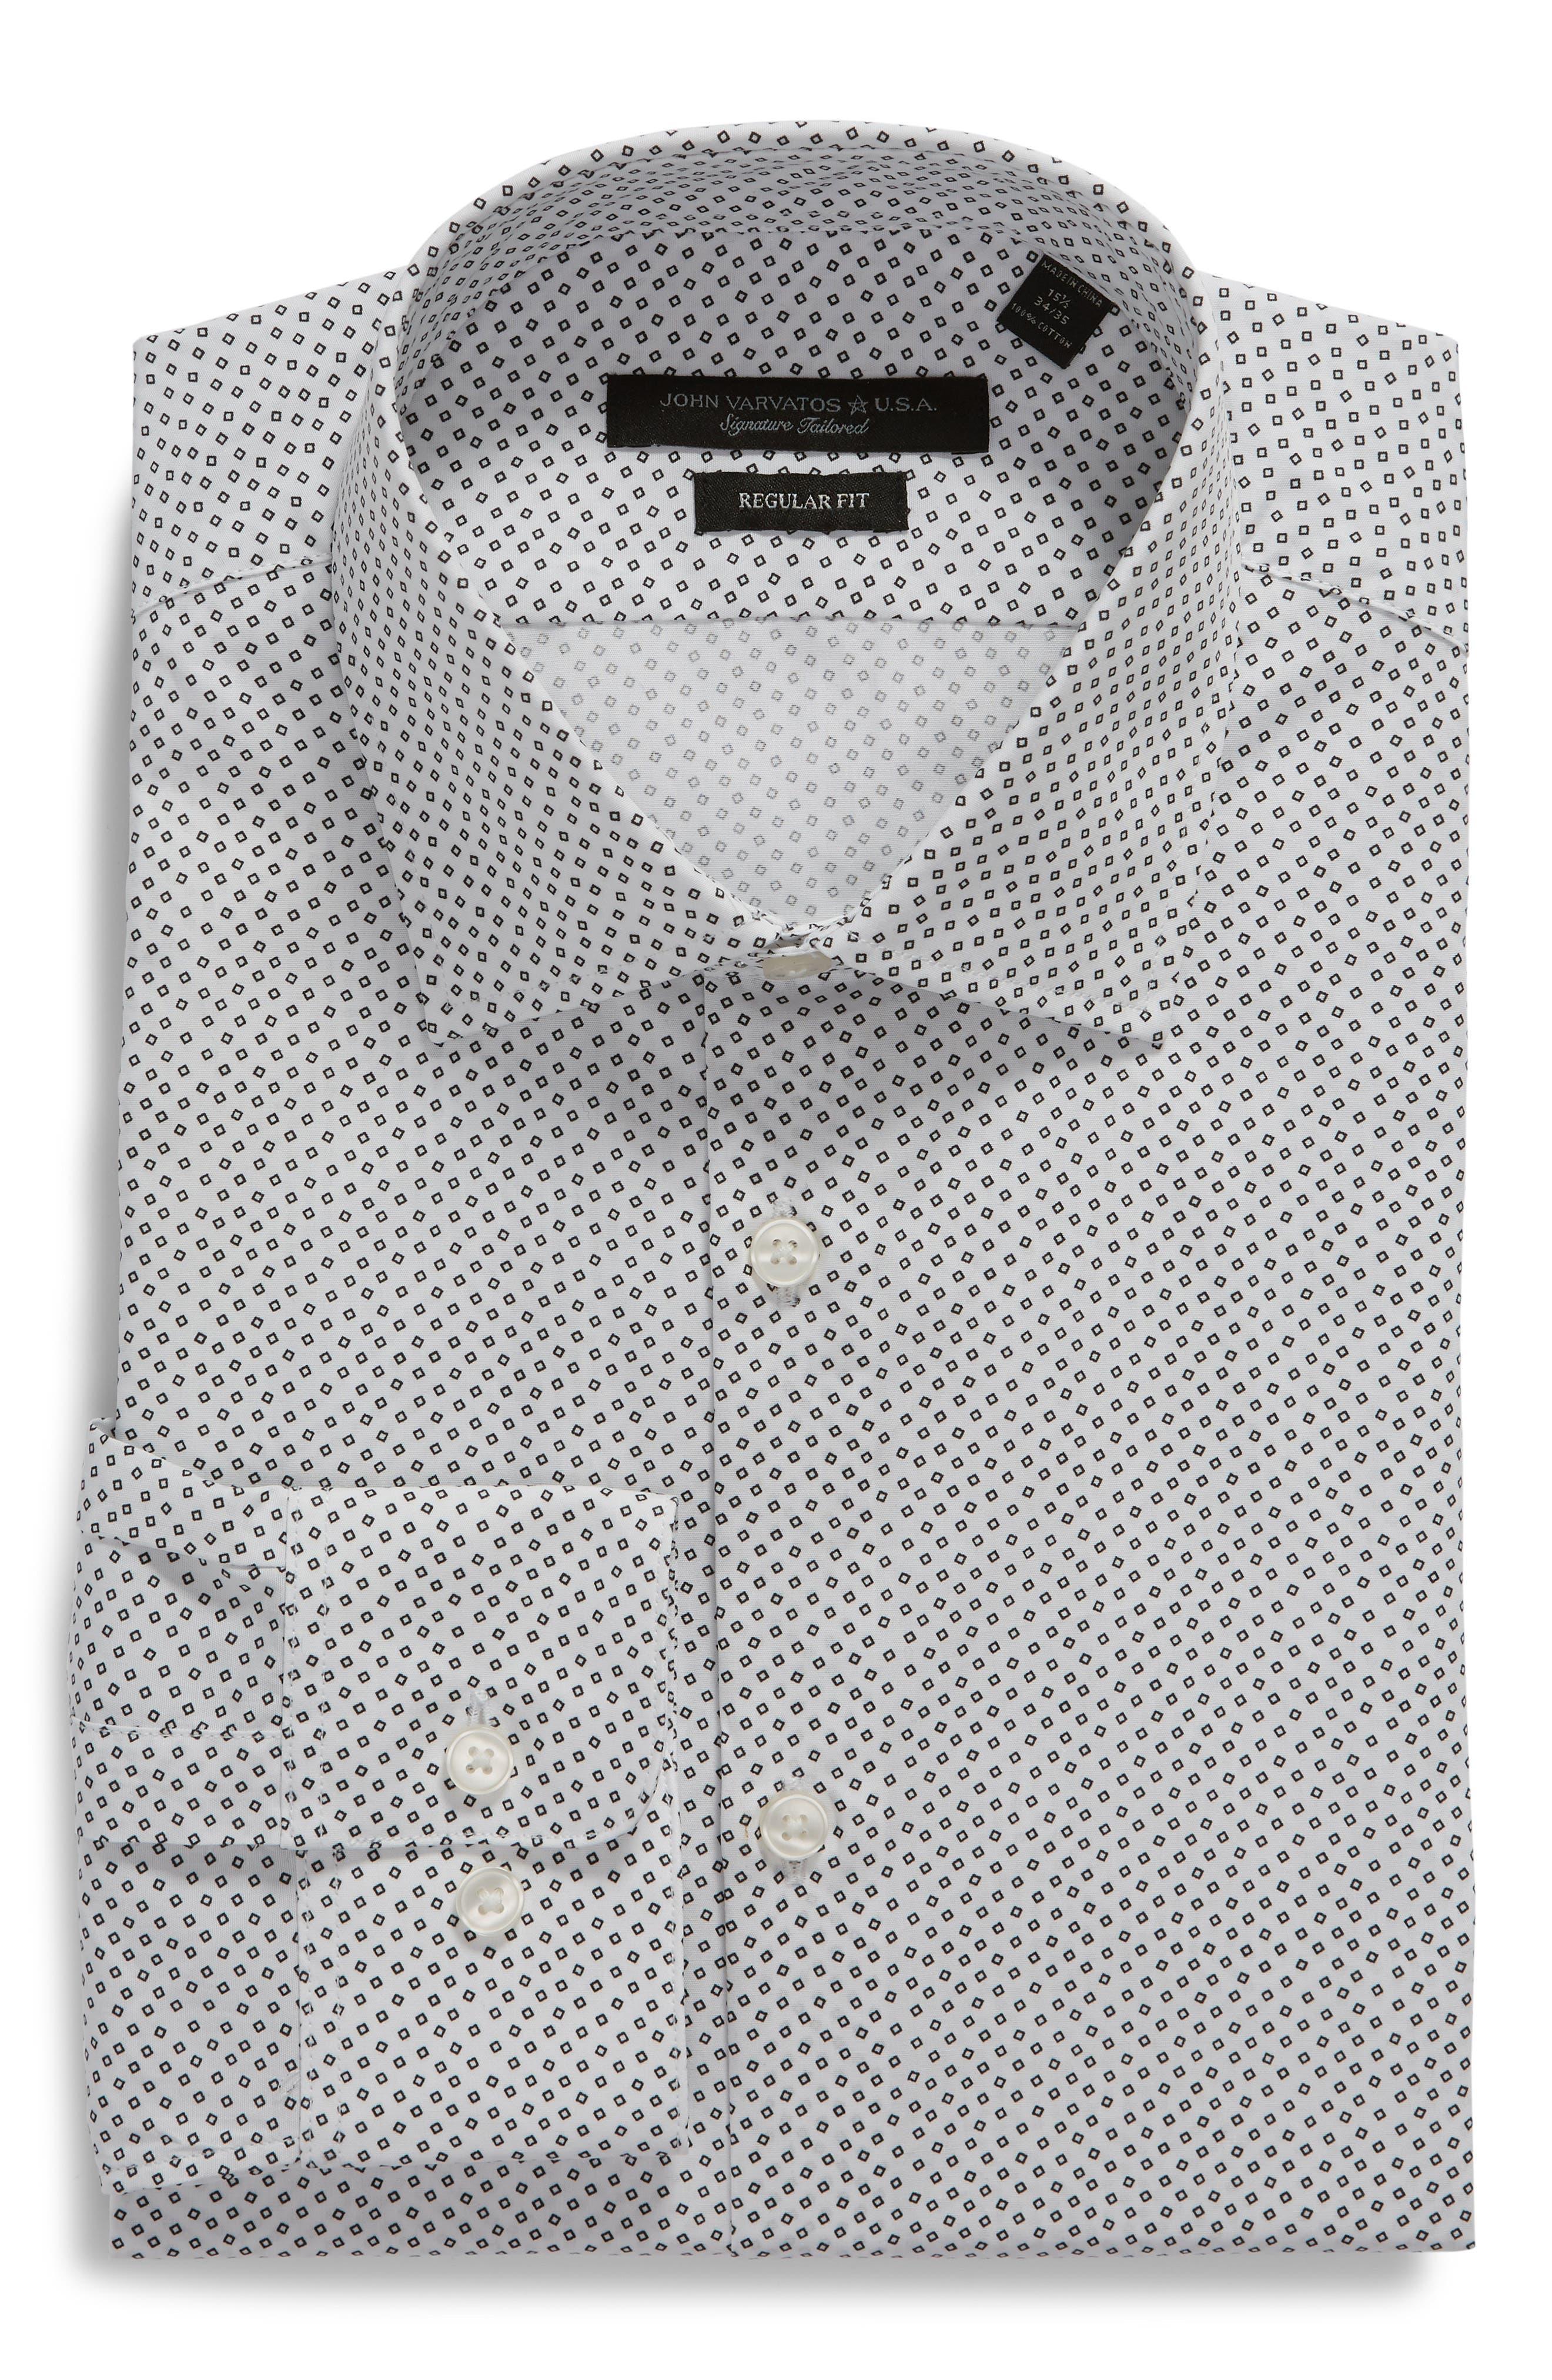 Regular Fit Print Dress Shirt,                             Alternate thumbnail 5, color,                             SALT